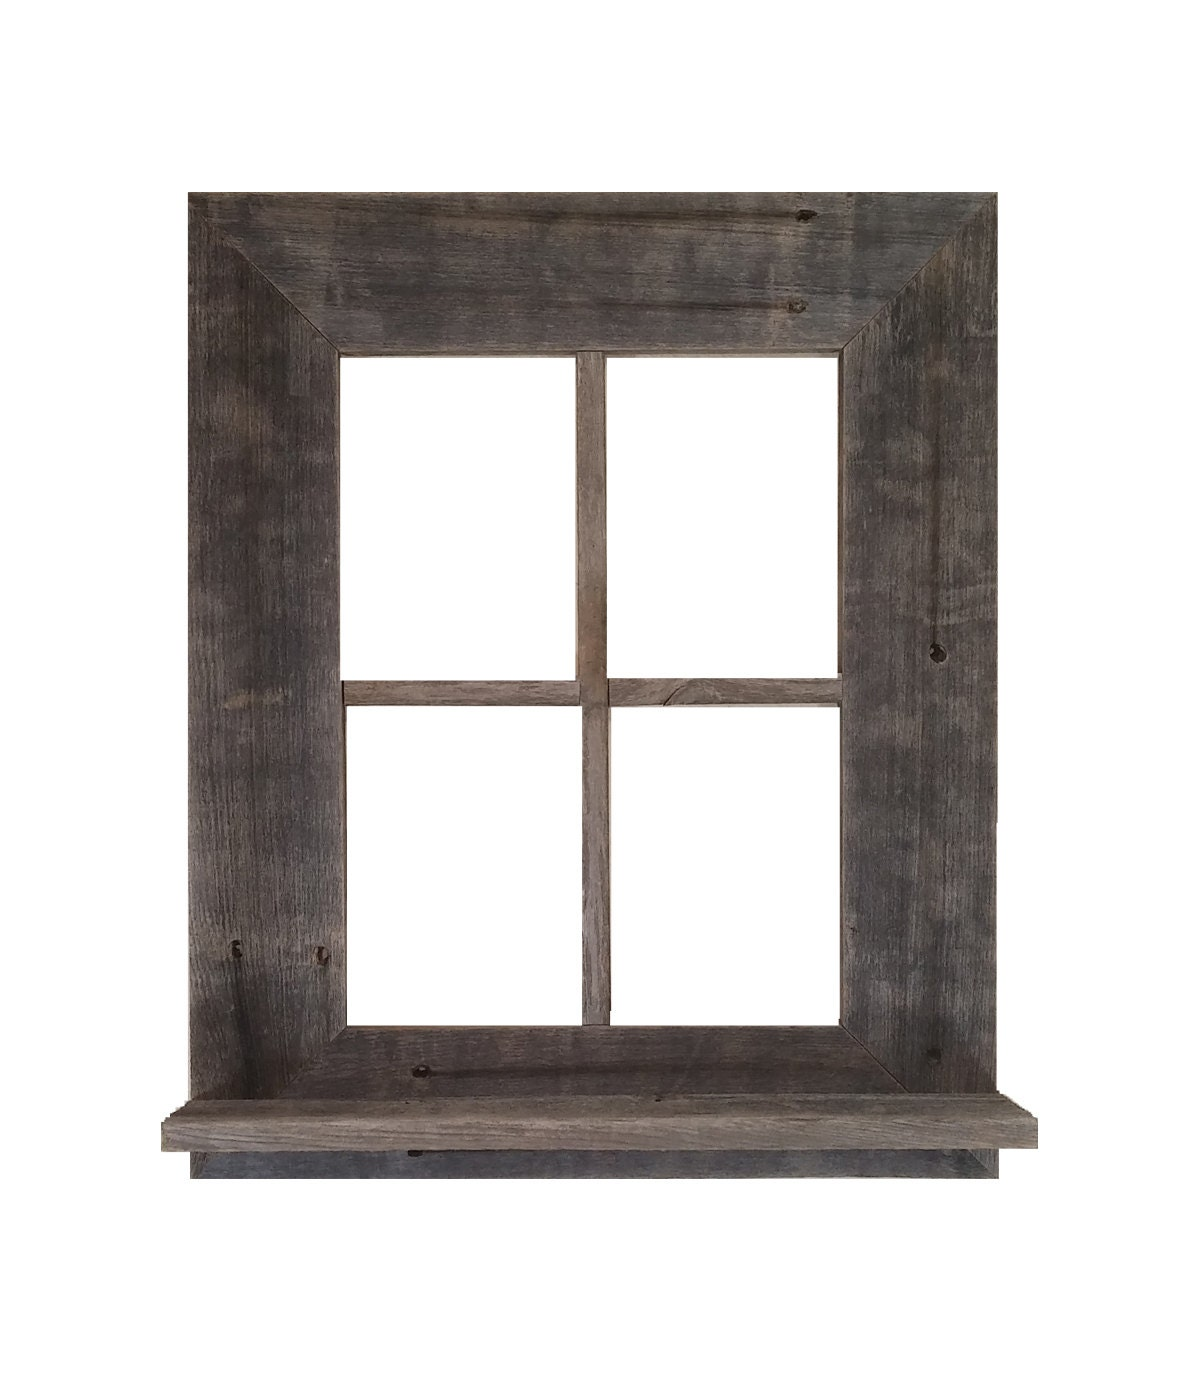 Rustic Barn Wood Window Frame With Shelf Amp Key Holder